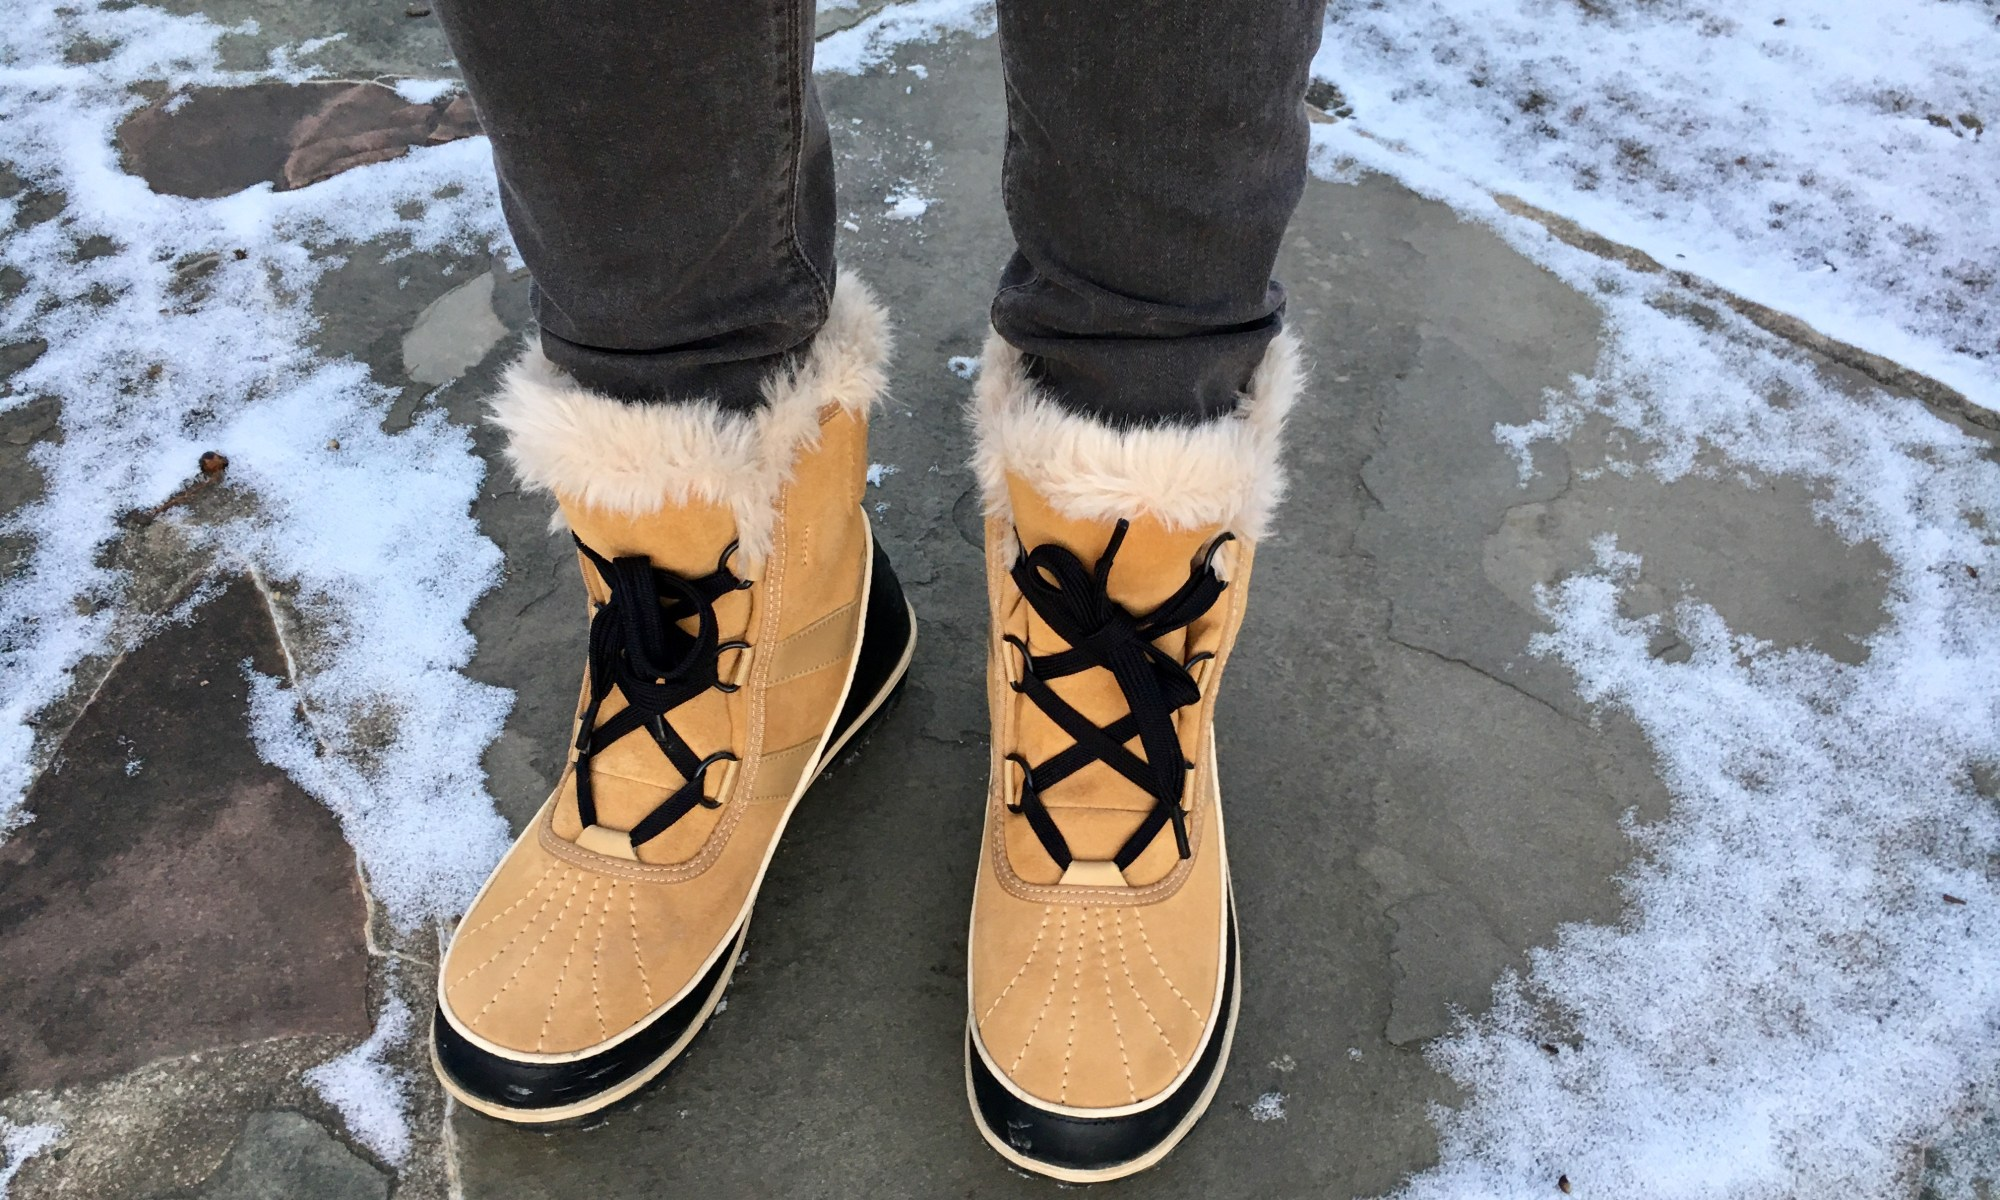 Sorel Boots - Winter Snow Boots - Fashion Favorite - SC's Scoop